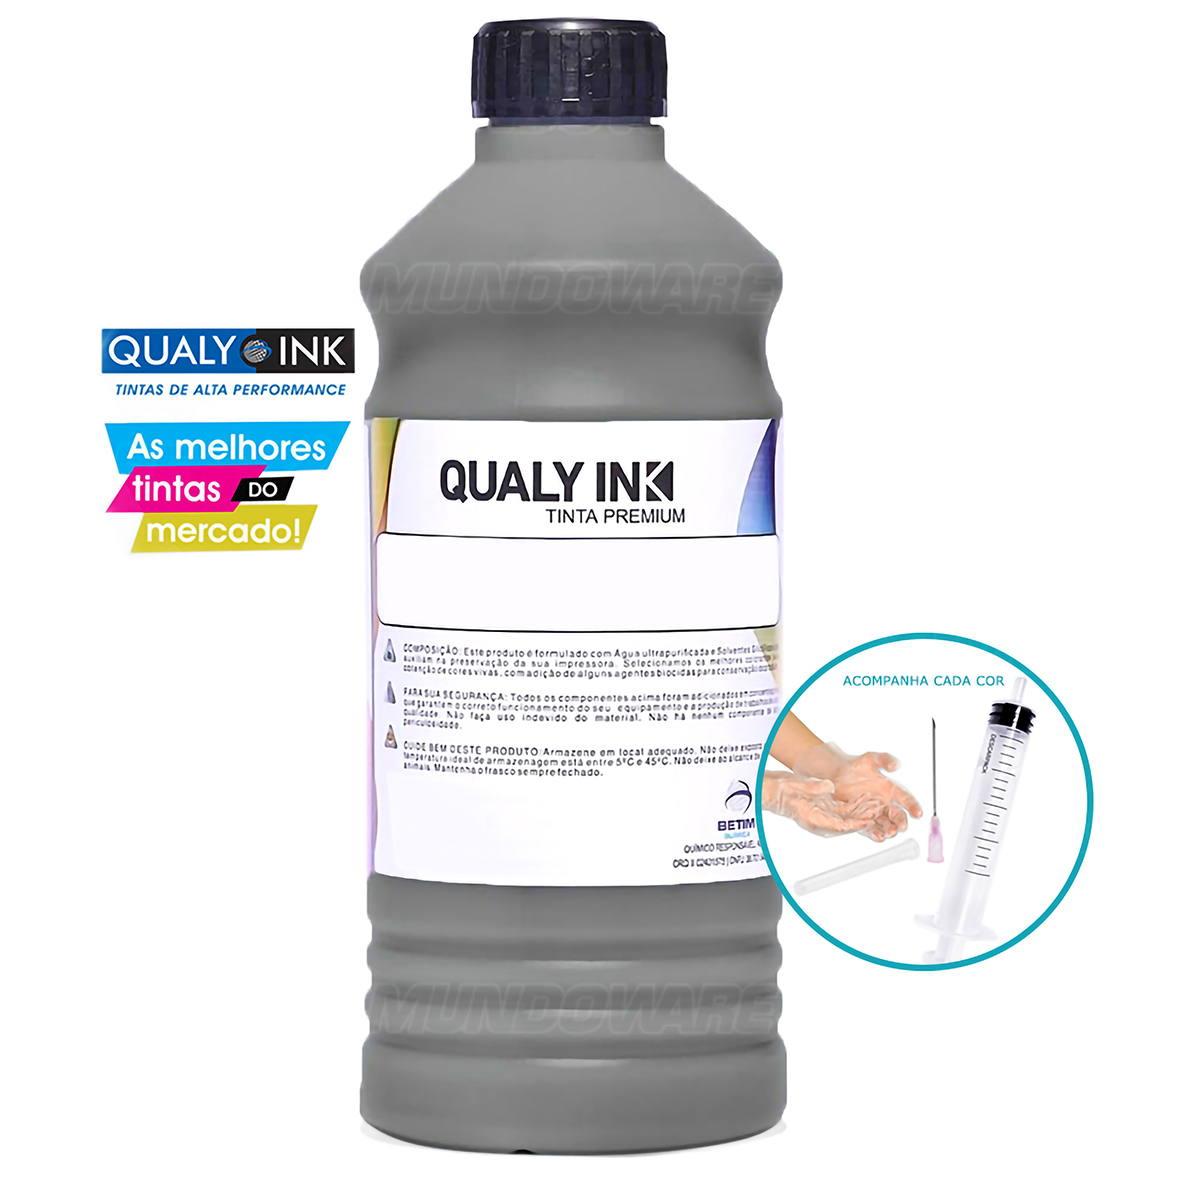 Compatível: Tinta Corante Qualy-Ink BC3H-1179 para HP Pro 8000 8100 8500 8600 6230 8630 251dw 276dw Preto Refil 1L